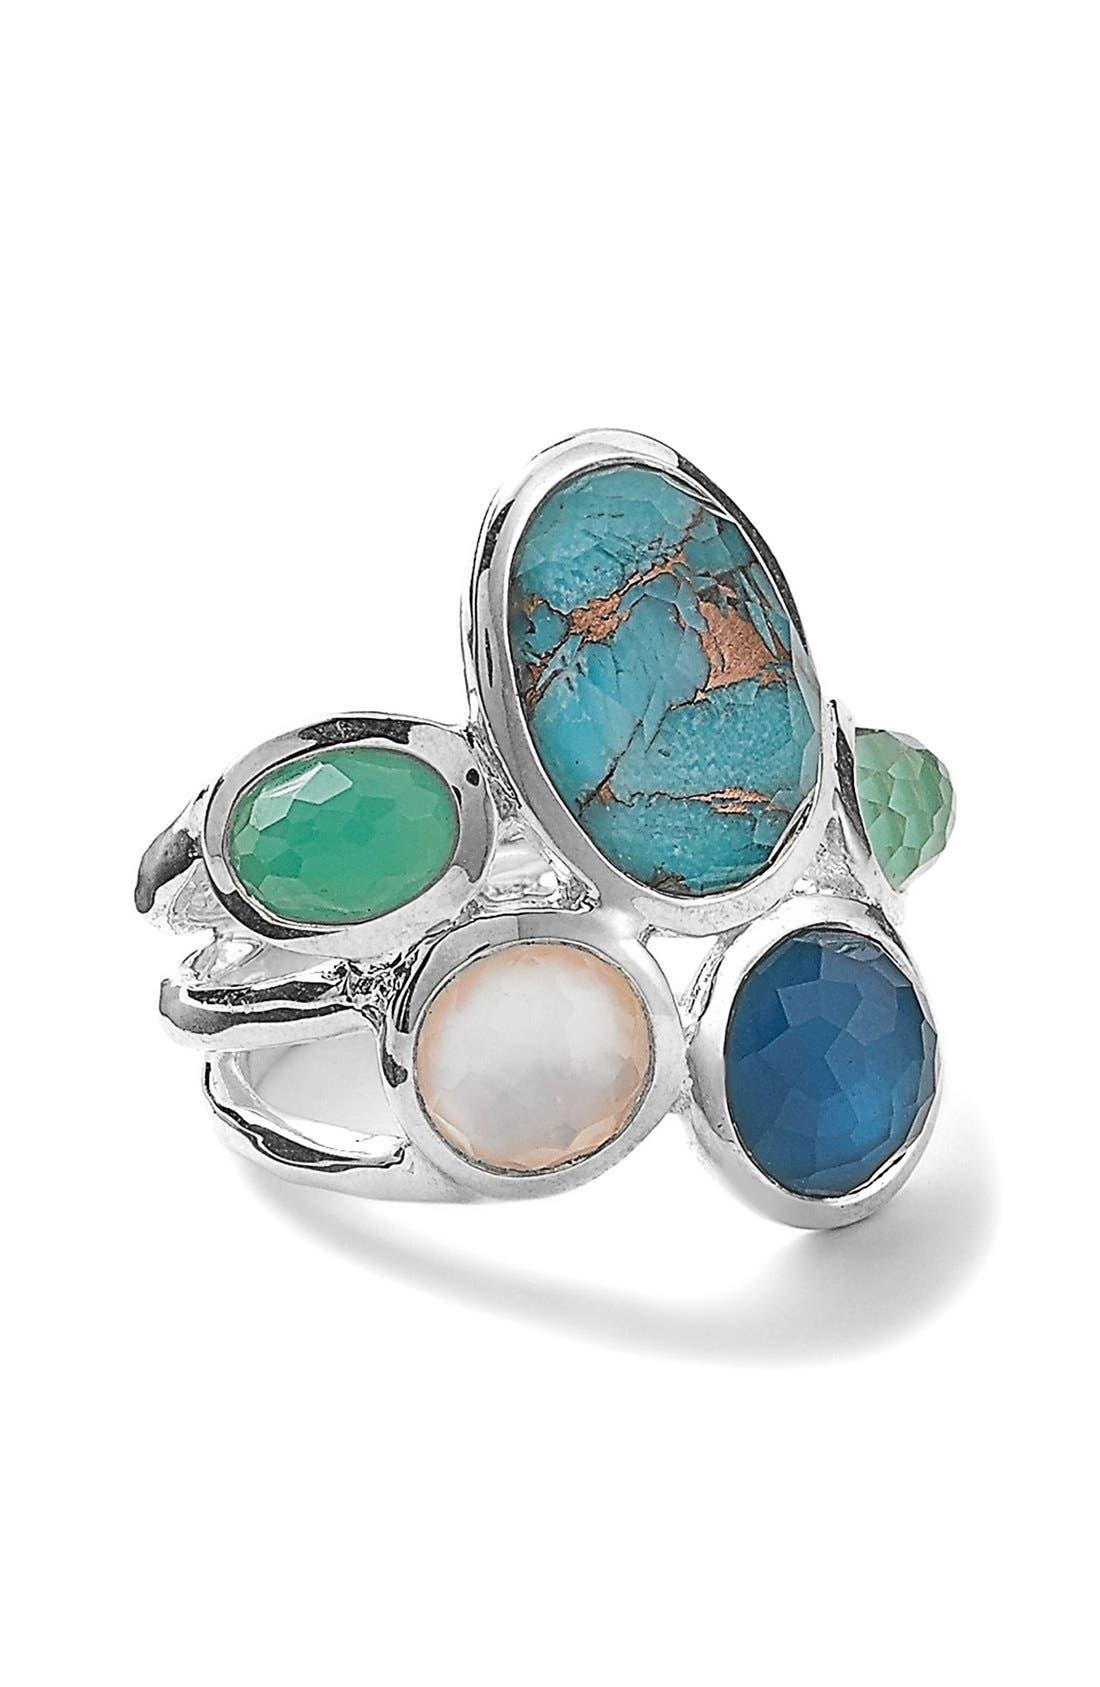 Alternate Image 1 Selected - Ippolita 'Wonderland' Cluster Statement Ring